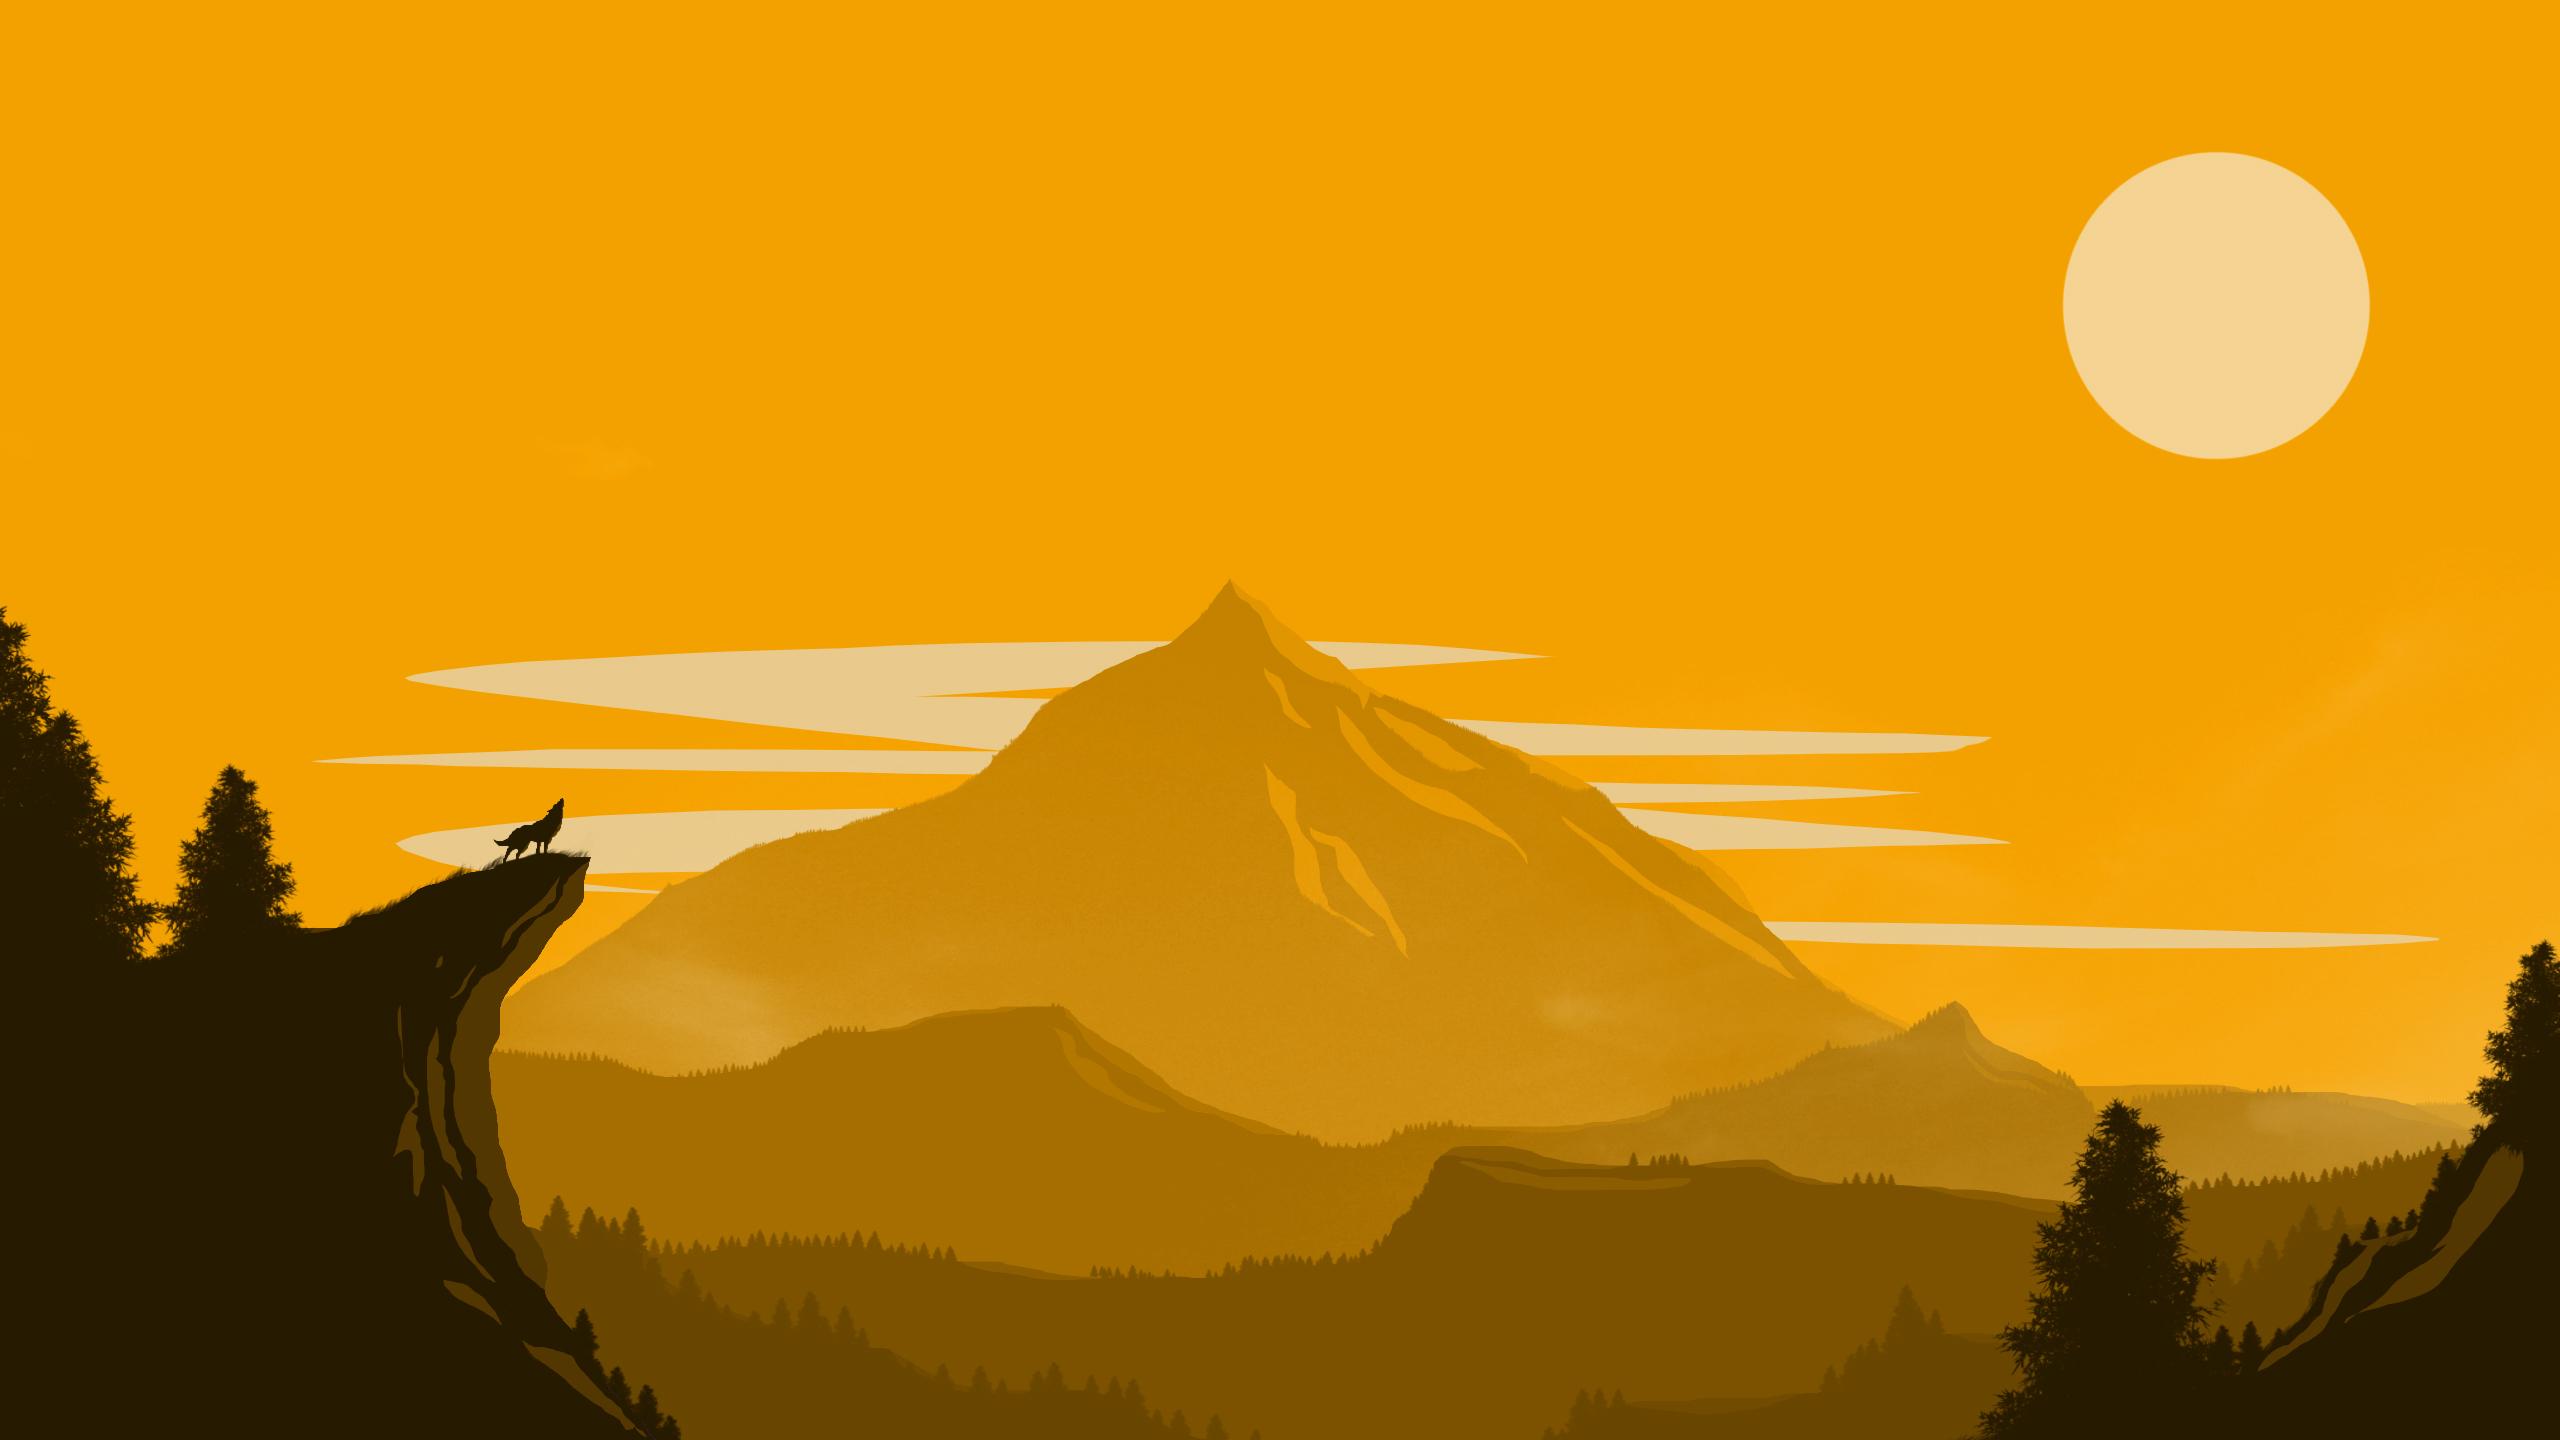 Simple Firewatch Wallpaper Hd Artist 4k Wallpapers Images